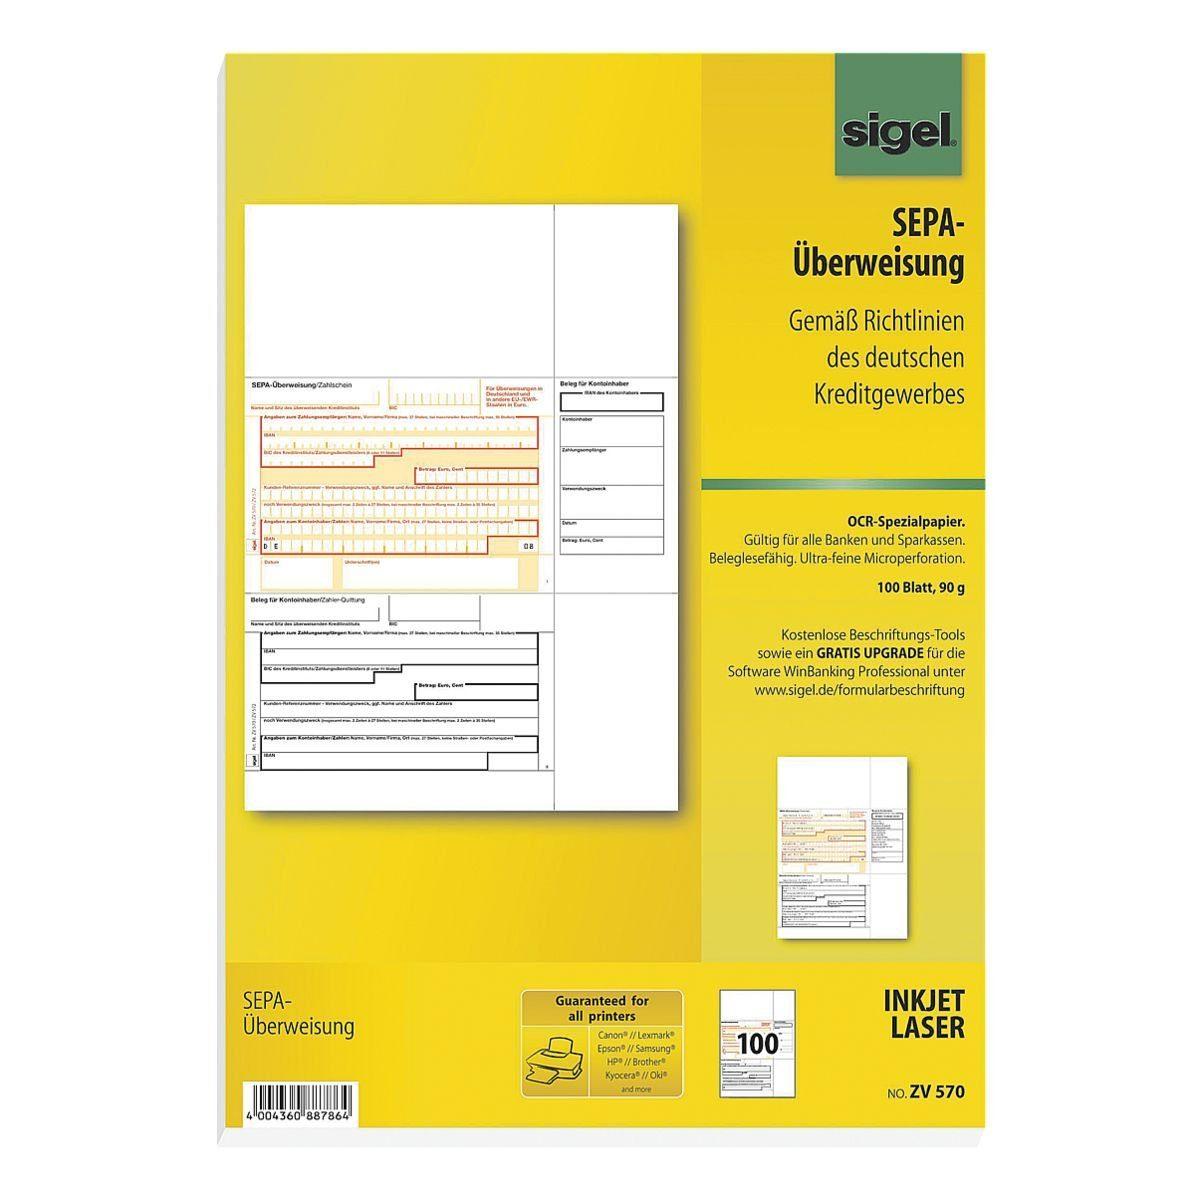 Sigel PC-SEPA-Überweisung